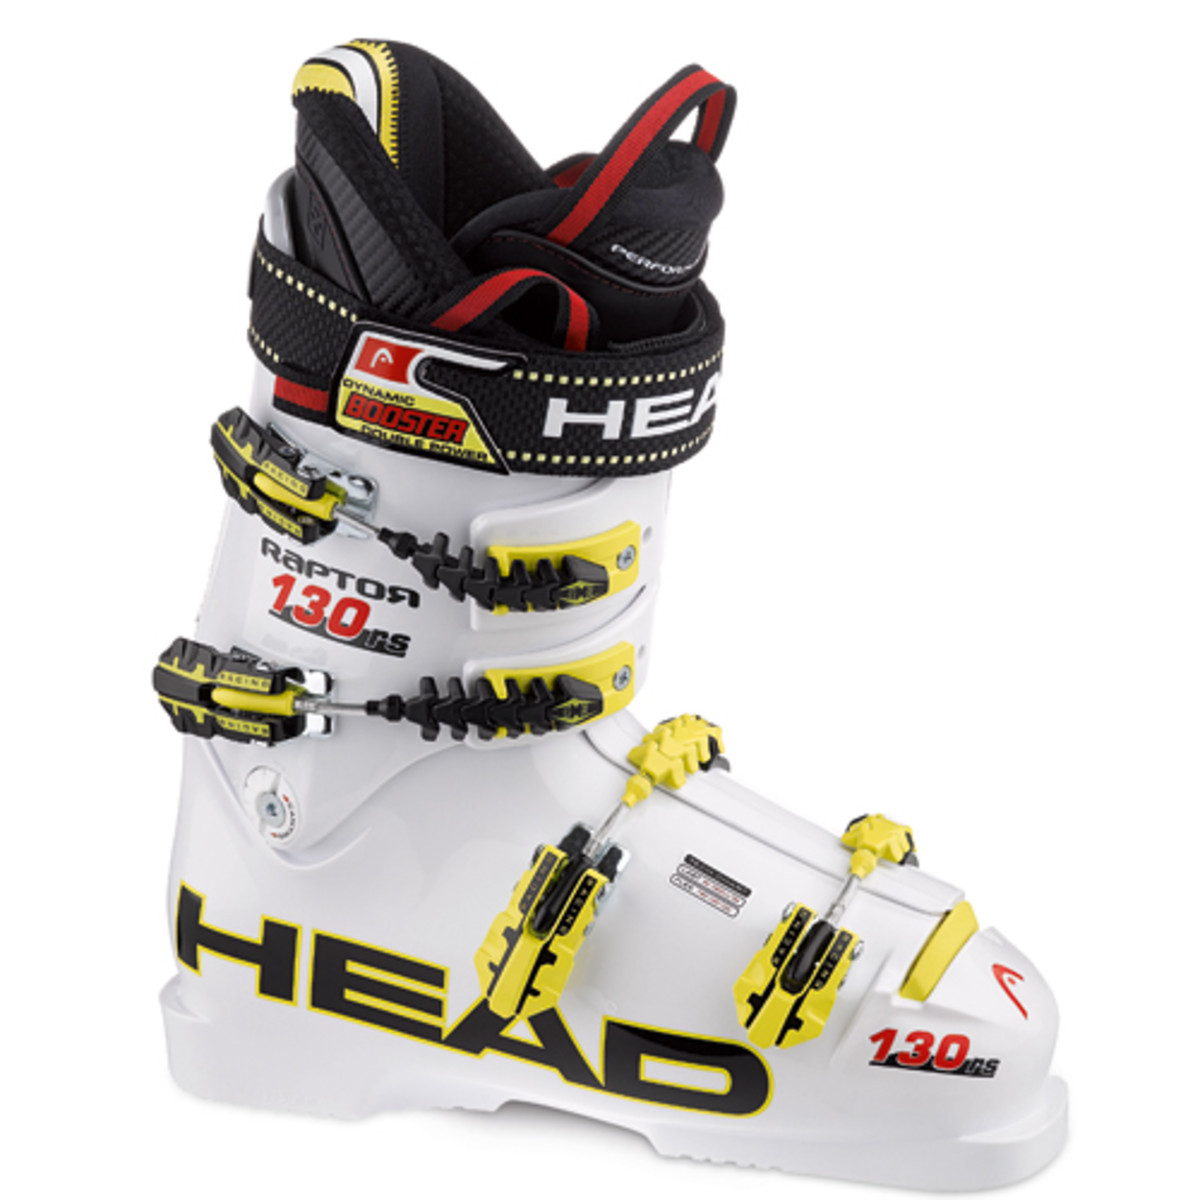 chaussure ski head